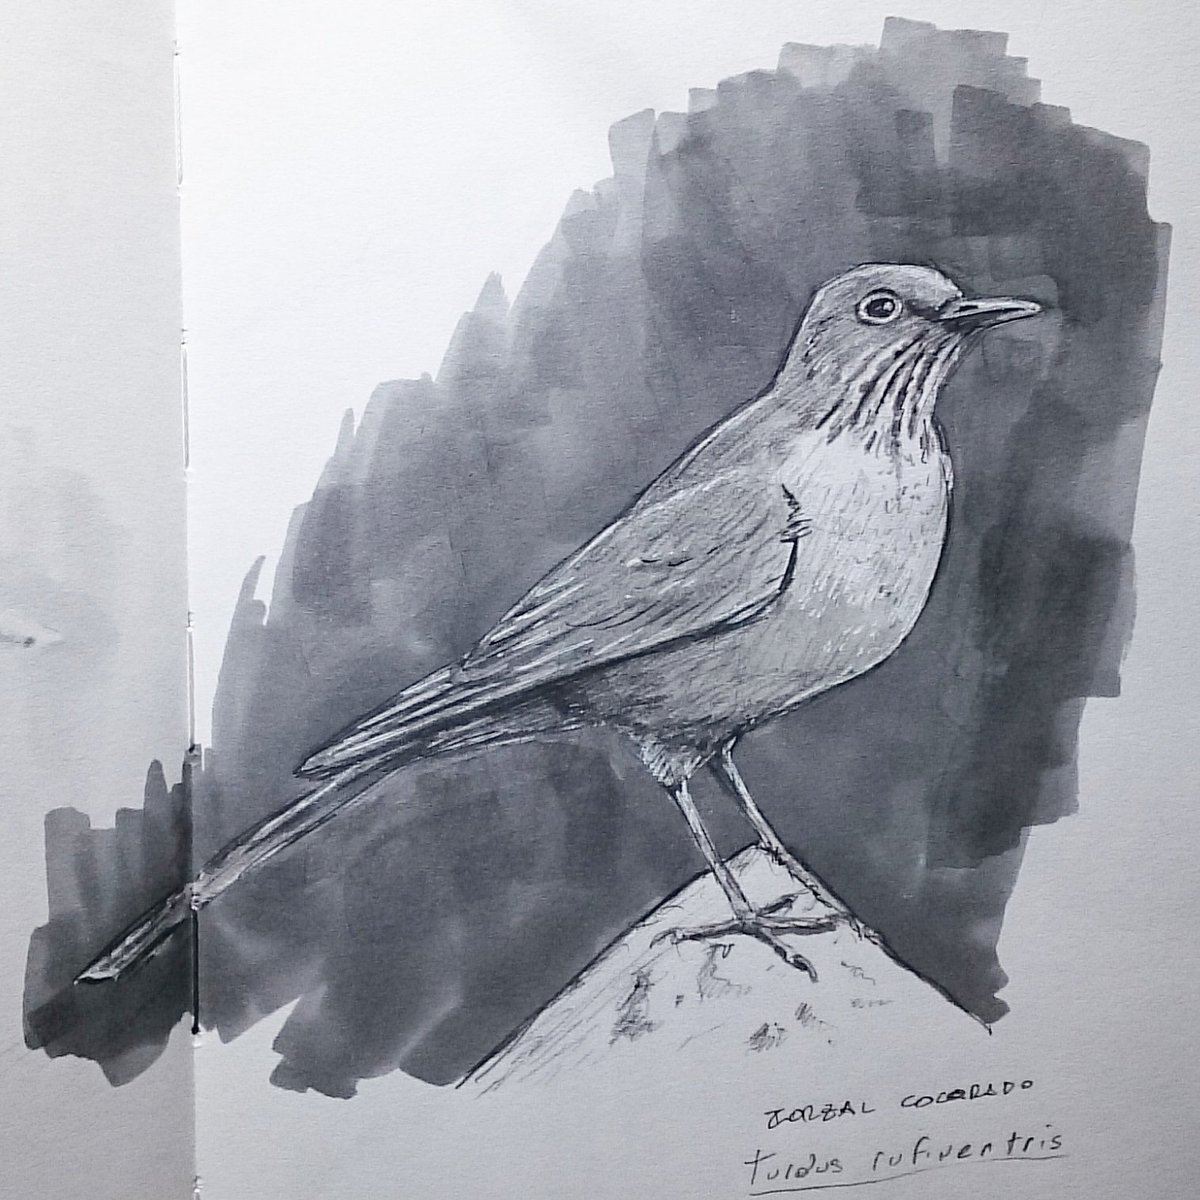 Zorzal colorado (_Turdus rufiventris_) #aves #avesargentinas #dibujo #drawing #sketch #sketchingnature #naturesketching #naturejournaling #naturejournal #wildlife #boceto #cuadernodebocetos #ebirdargentina #quarantine #sketchinginquarantine #cuarentena #dibujandoencuarentenapic.twitter.com/YCeJG1Yzsy